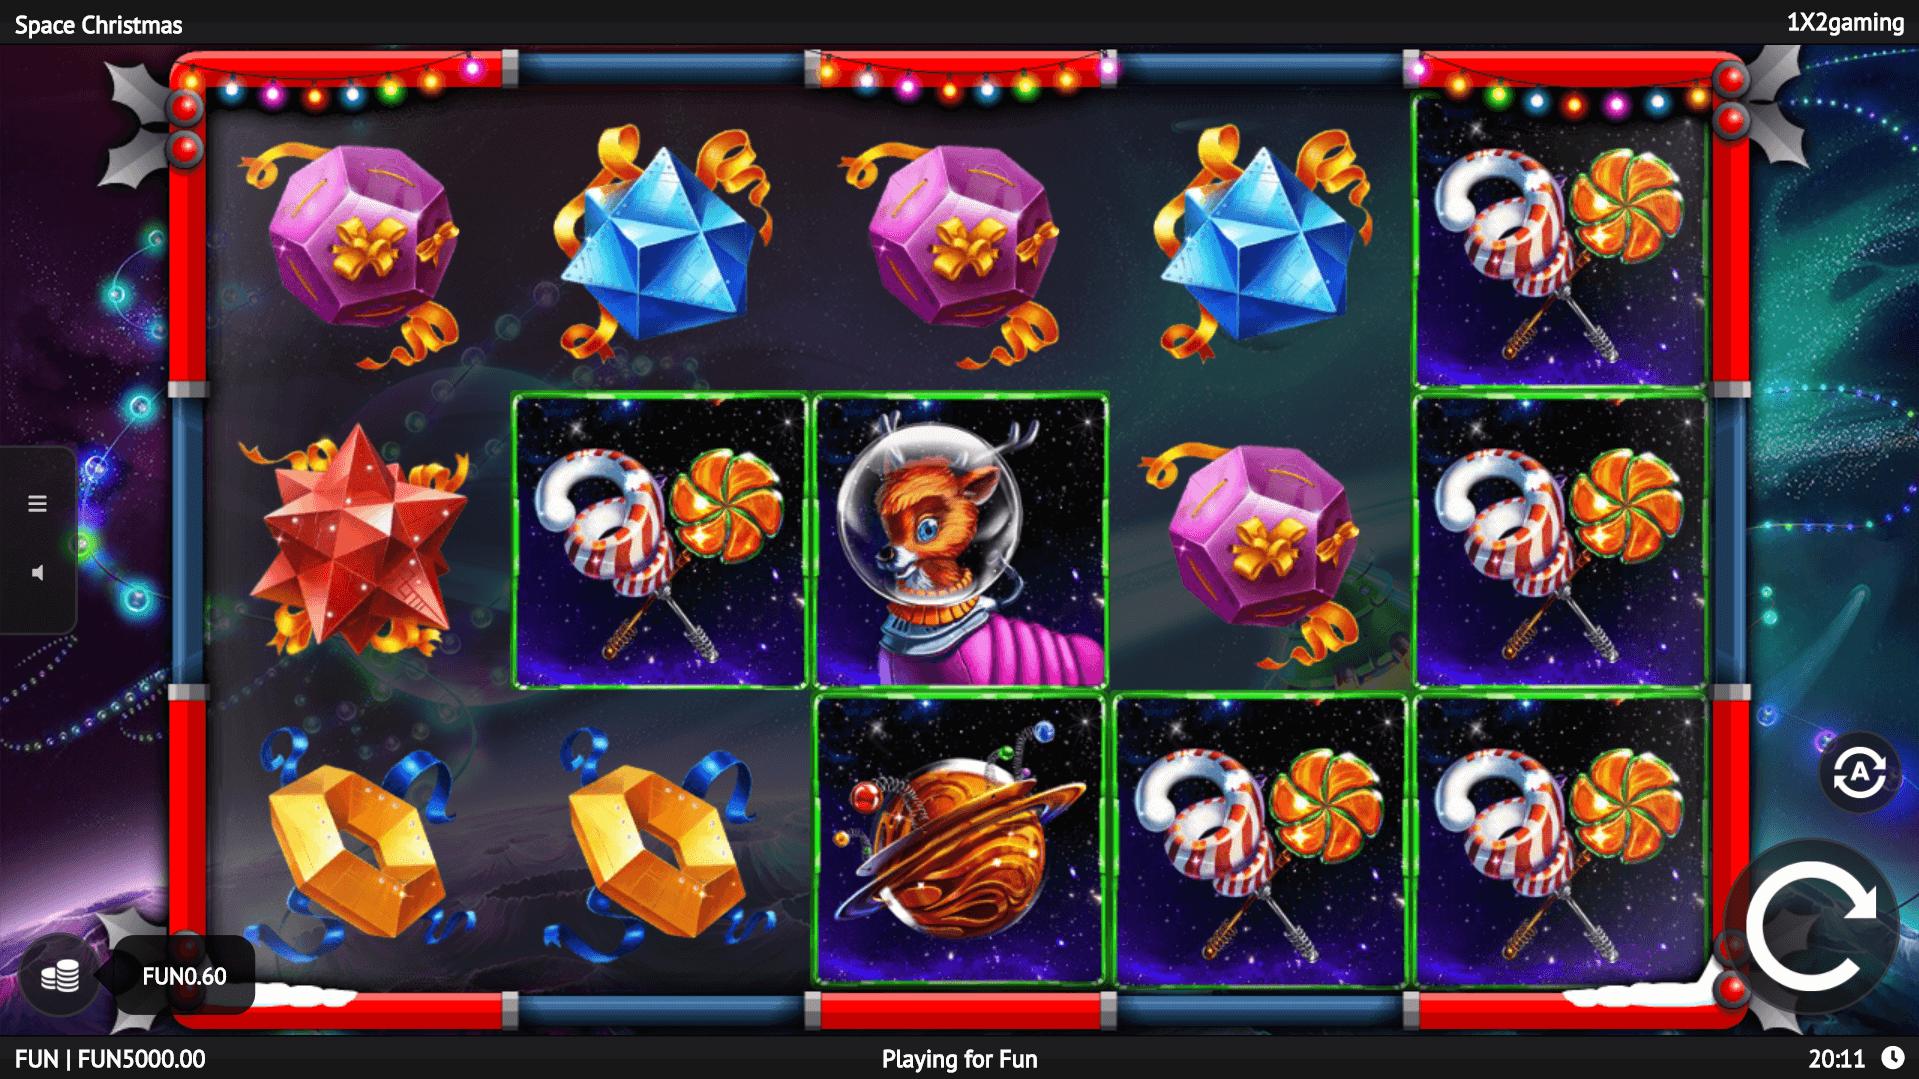 Space Christmas slot machine screenshot